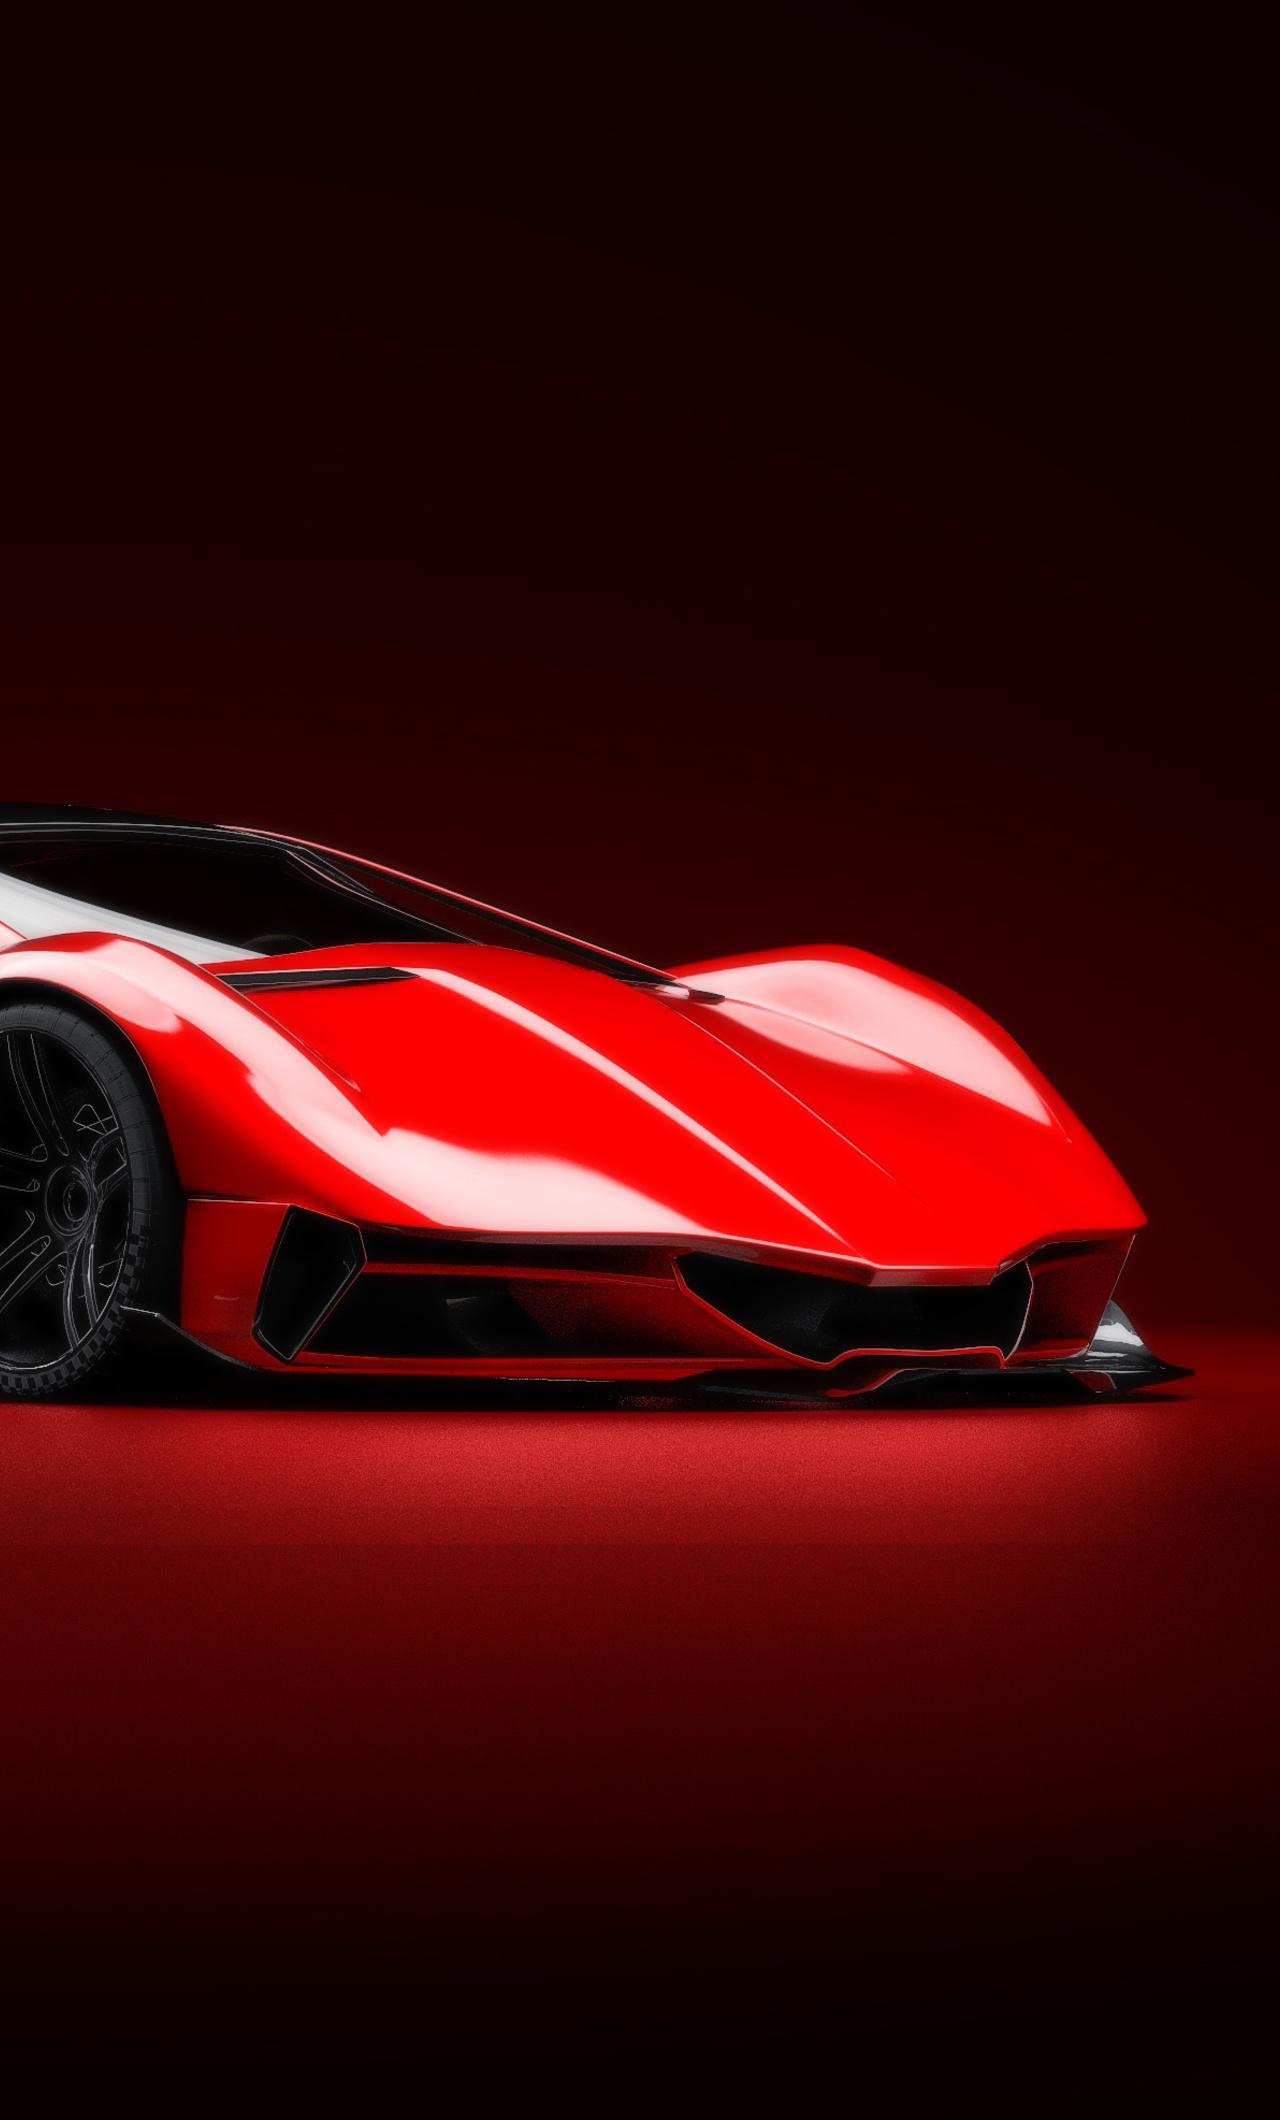 1280x2120 Lamborghini Countach Front Iphone 6 Hd 4k Wallpapers